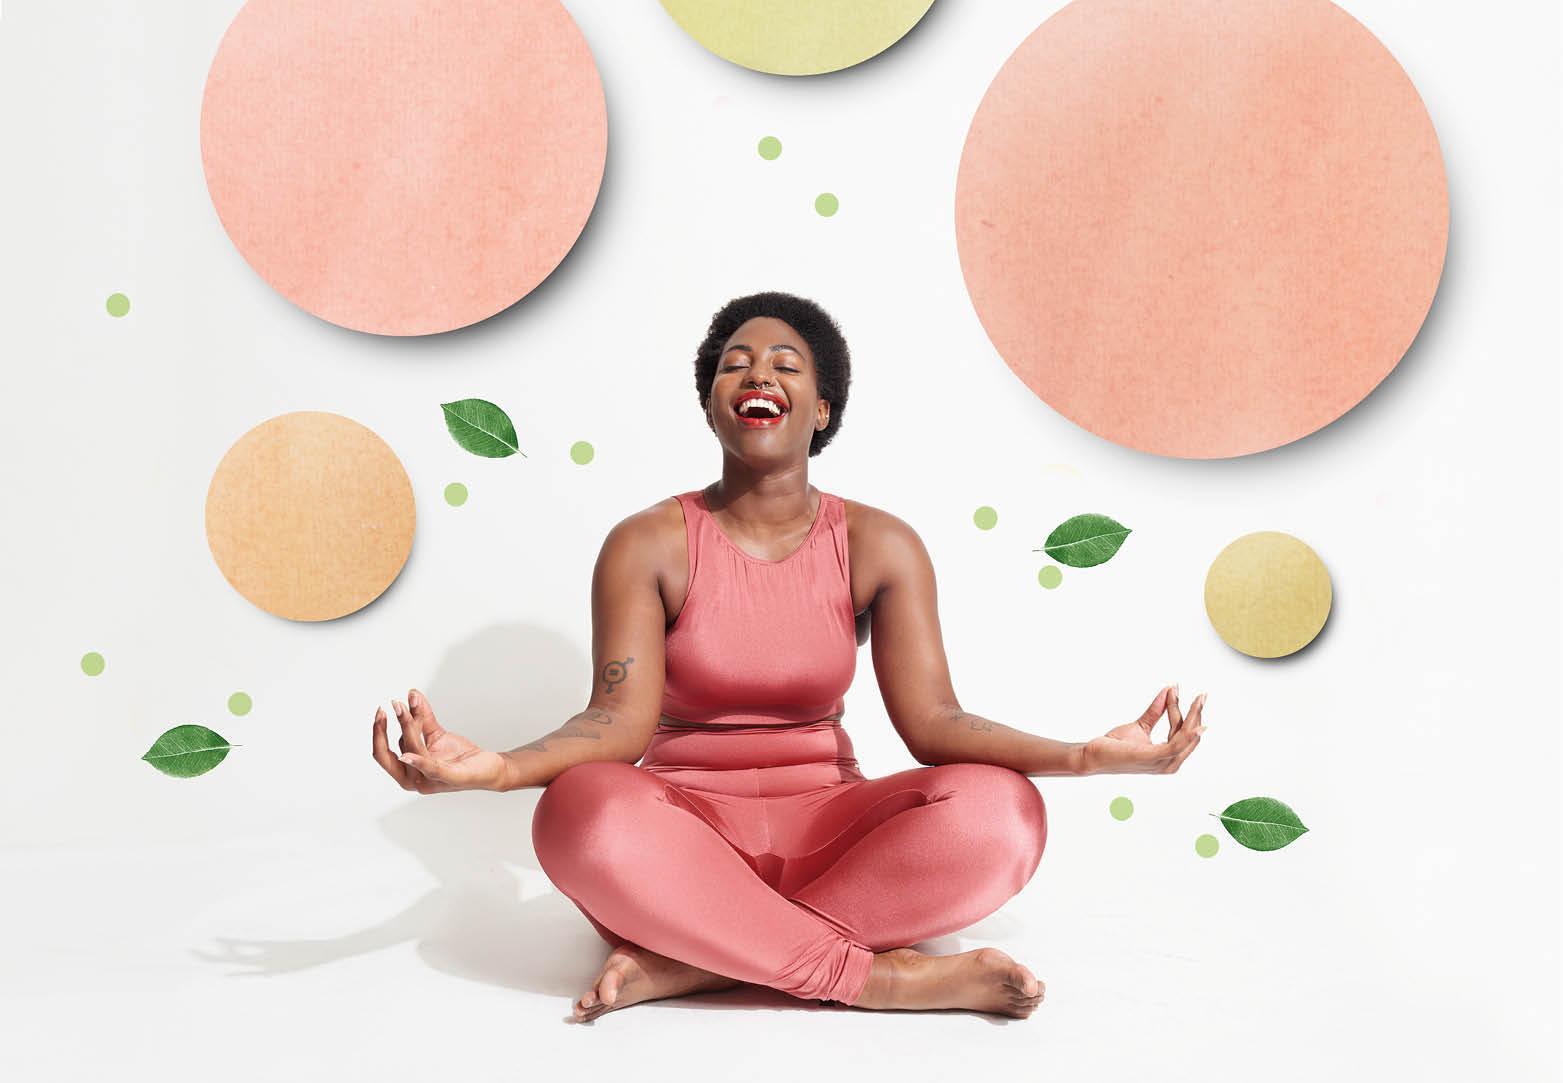 De leukste yogakleding voor International Yoga Day